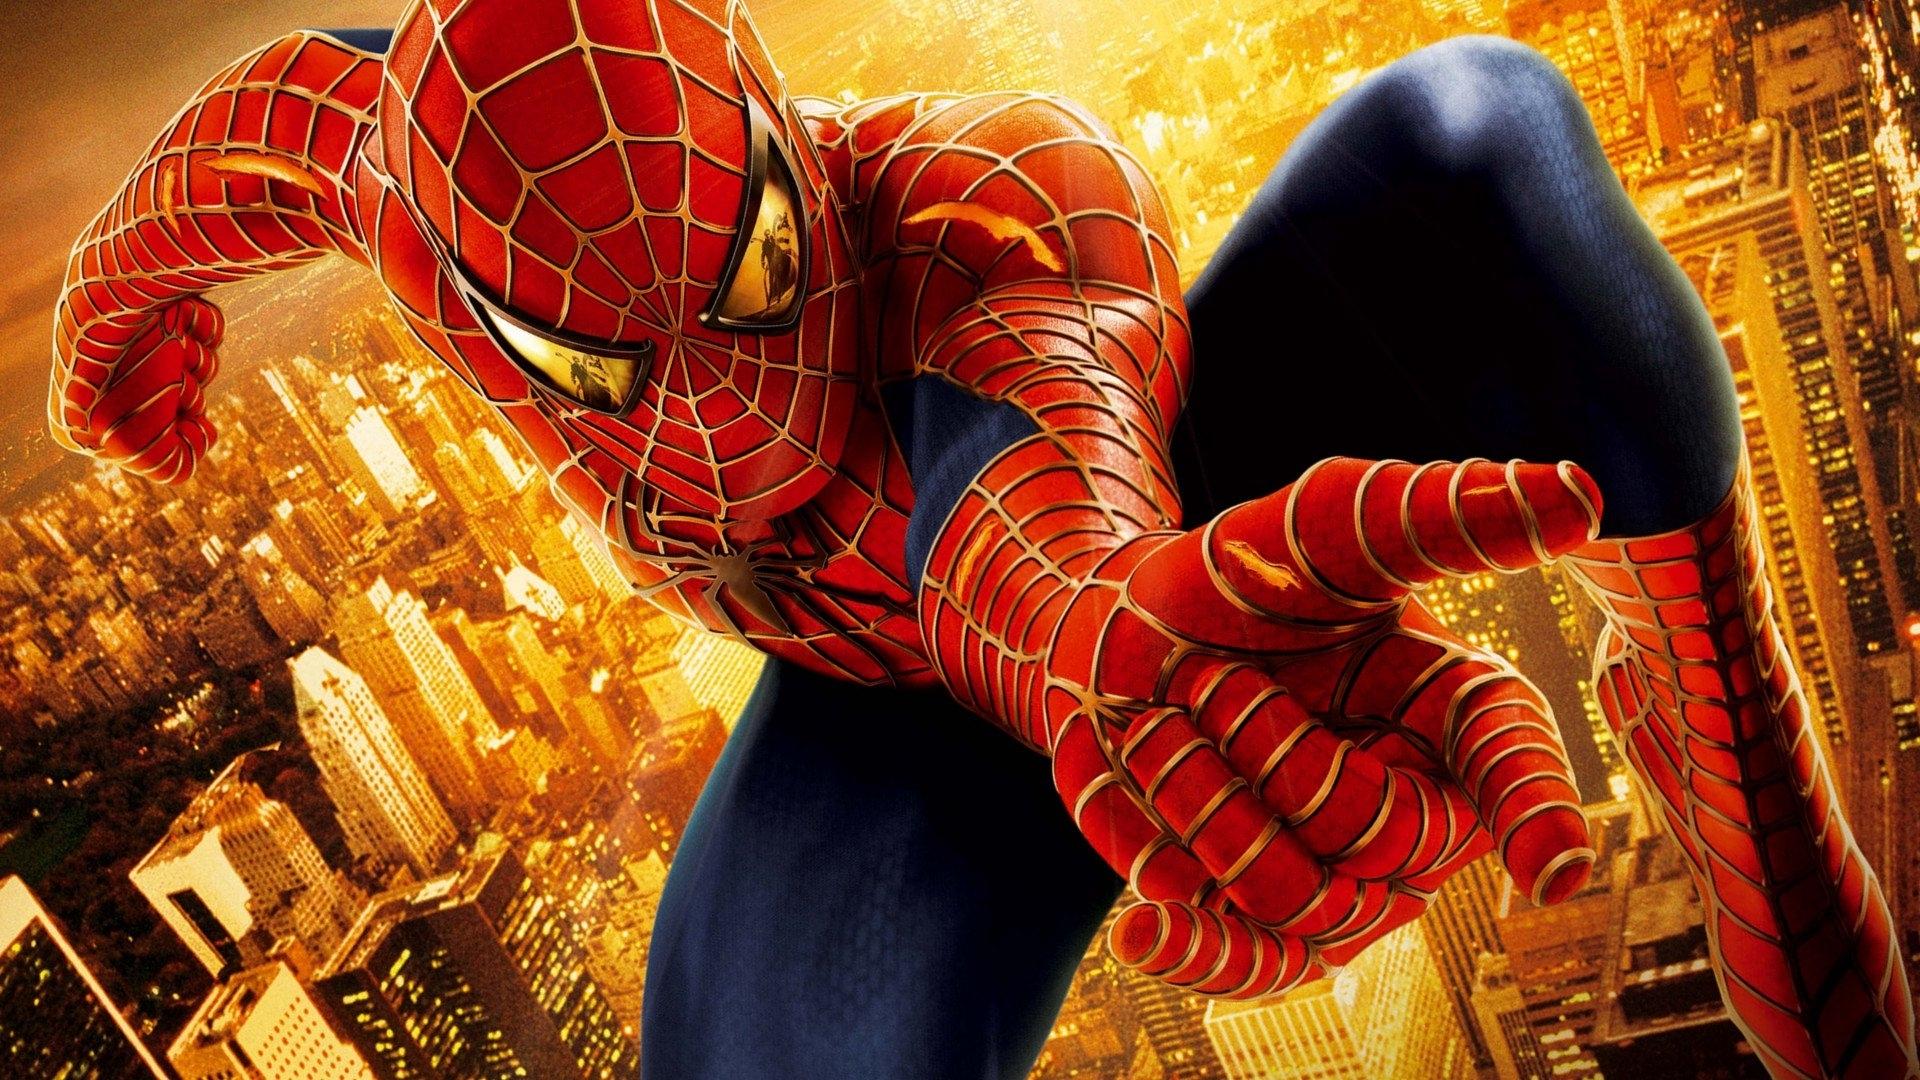 spider-man 2 full hd fond d'écran and arrière-plan   1920x1080   id